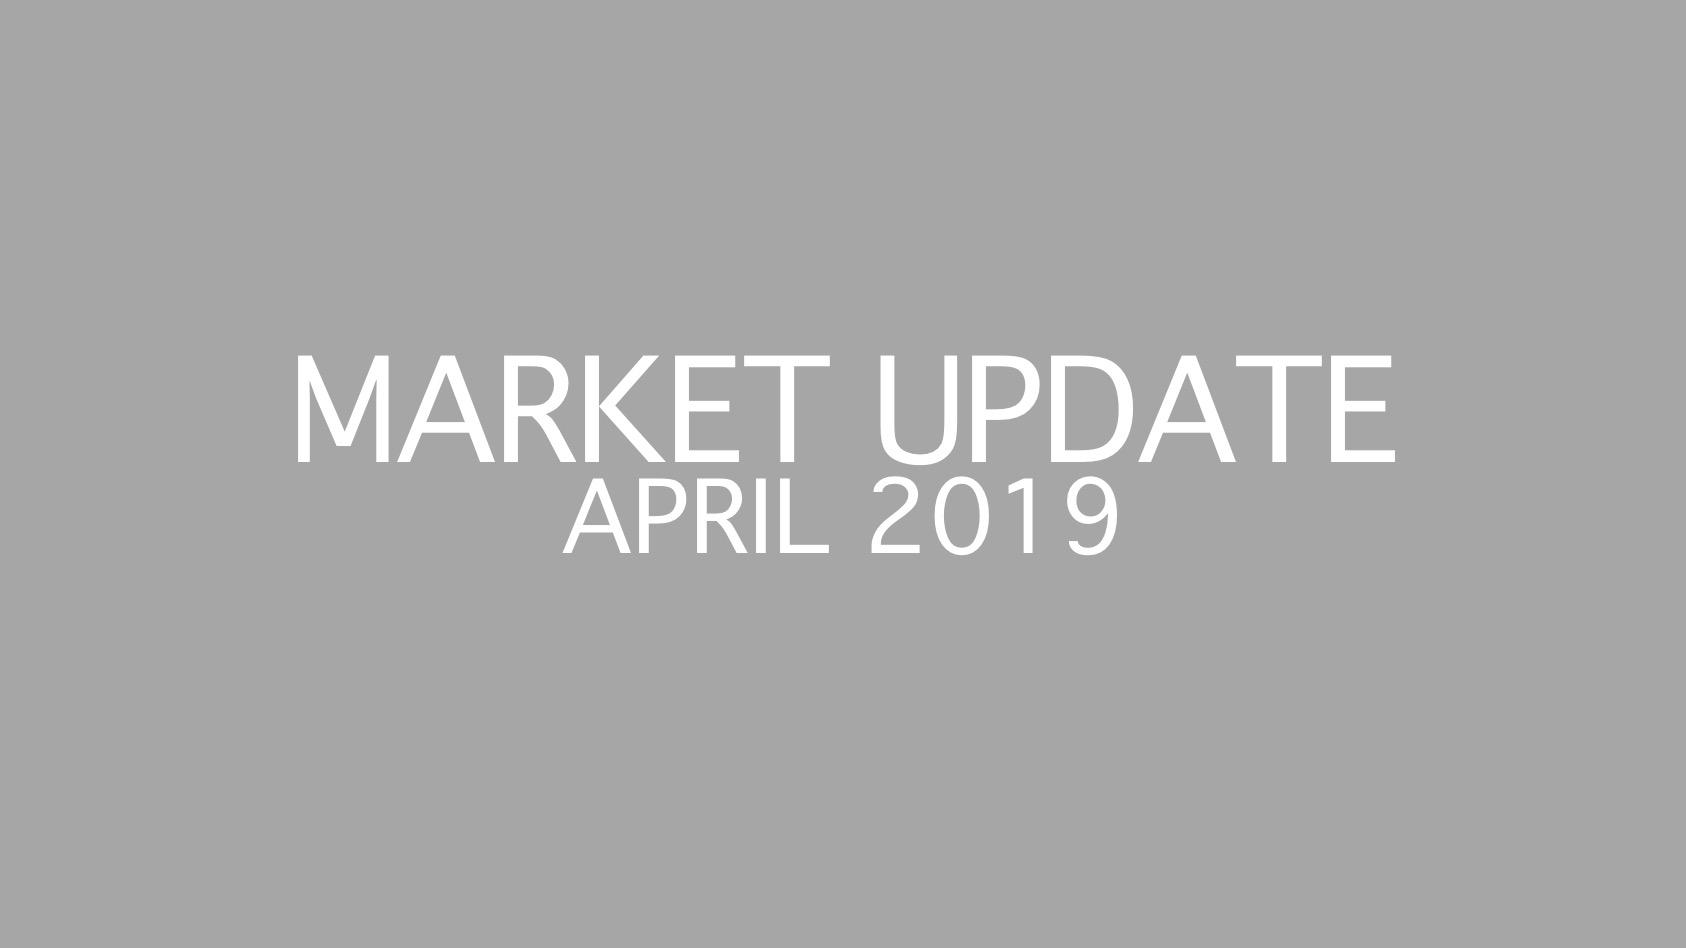 Peak season is here! April 2019 Real Estate and Mortgage Flash Report